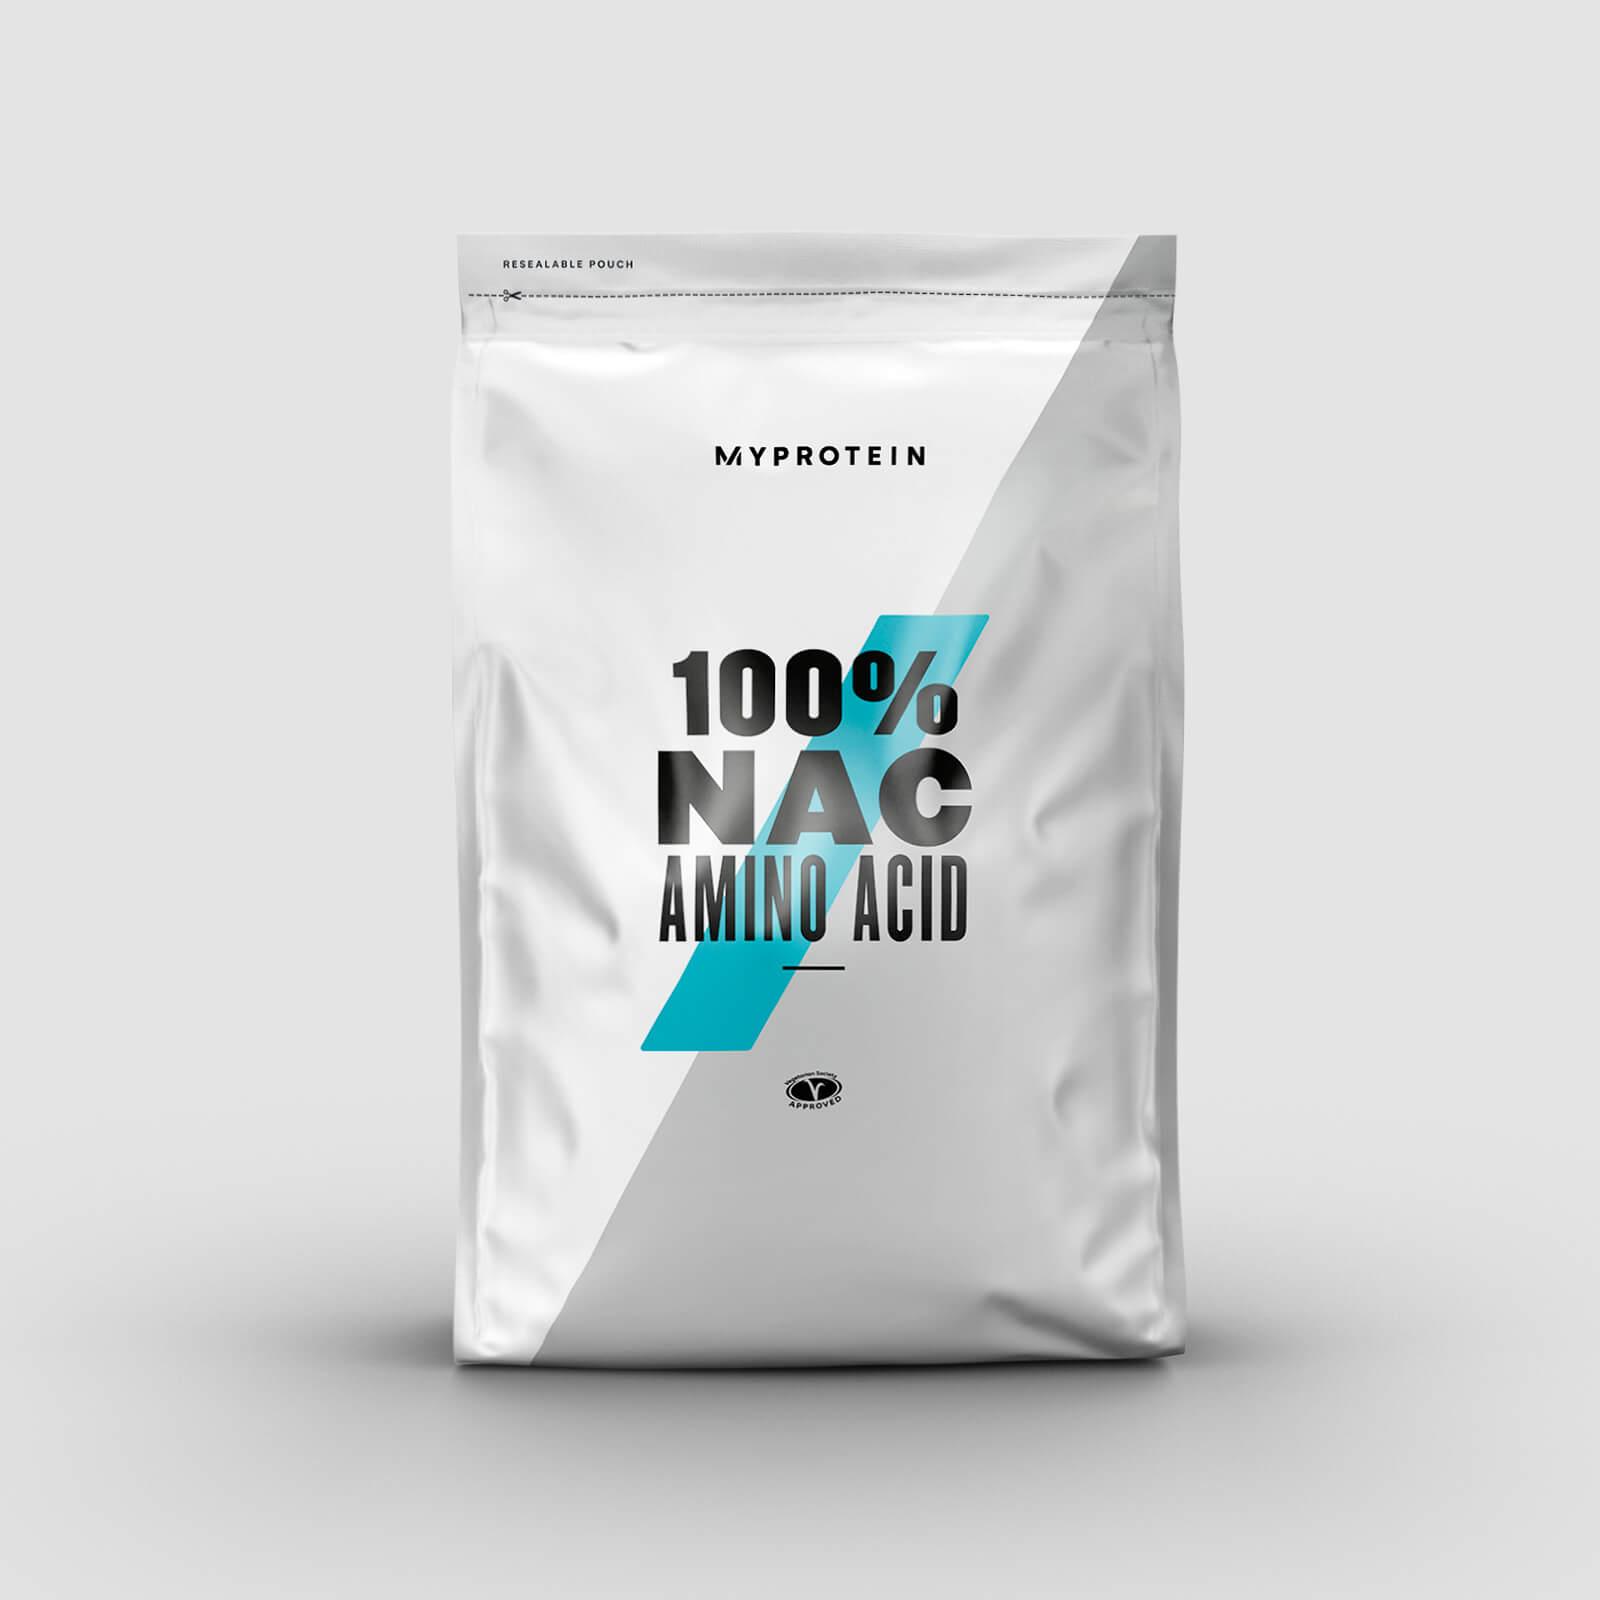 Myprotein 100% Αμινοξύ NAC (N-Ακετυλο-L-Κυστεΐνη) - 100g - Χωρίς Γεύση